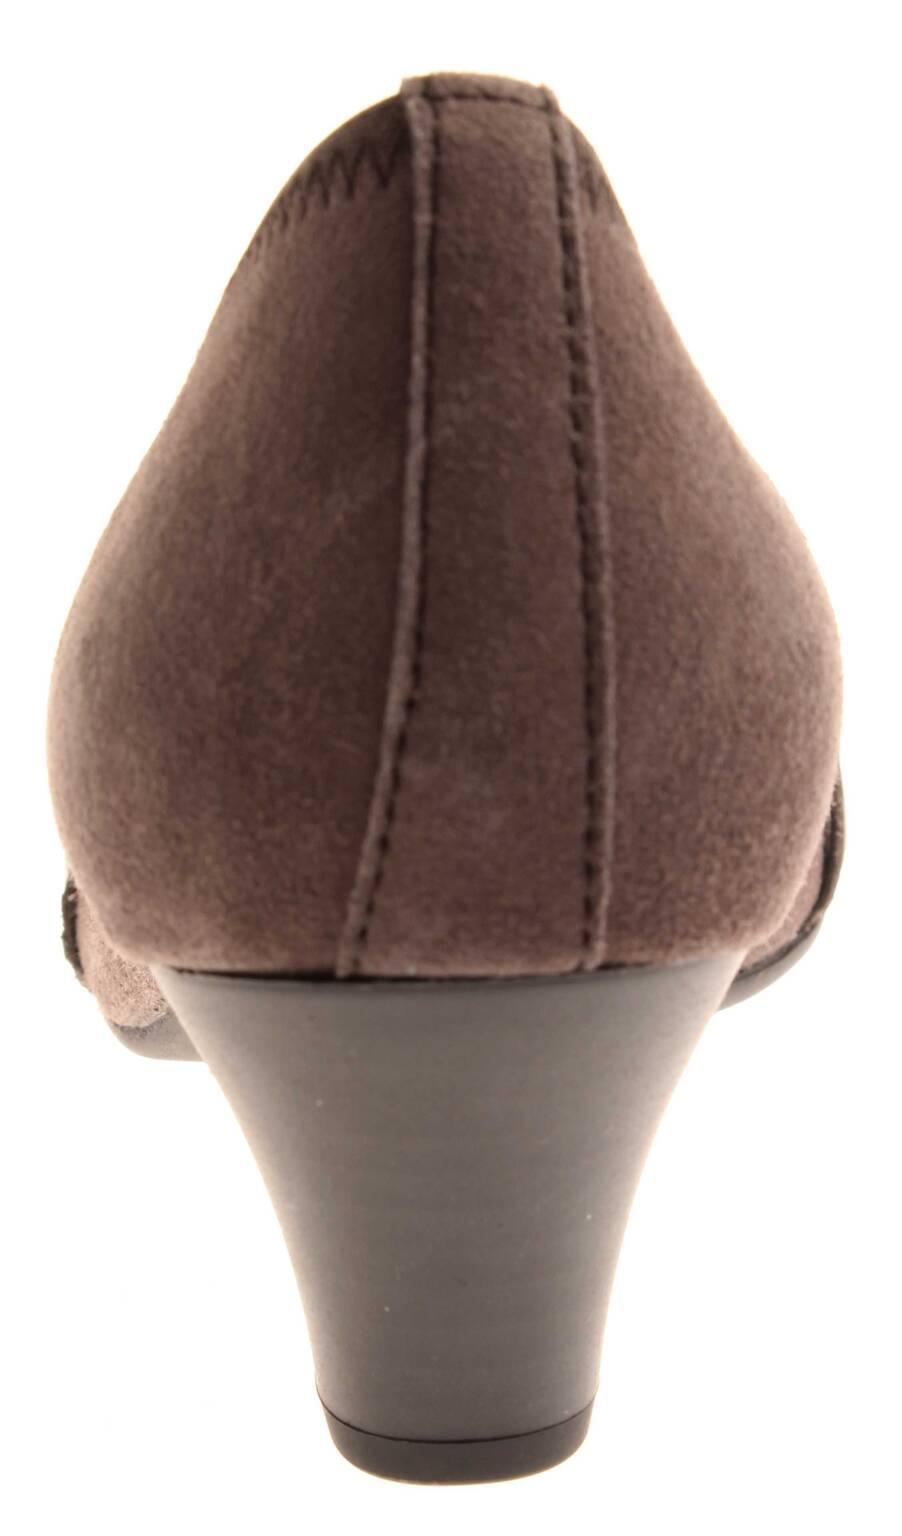 Gabor Damenschuhe Pumps Leder Damen grau Lederpumps Damen Leder 35.485 97fd55